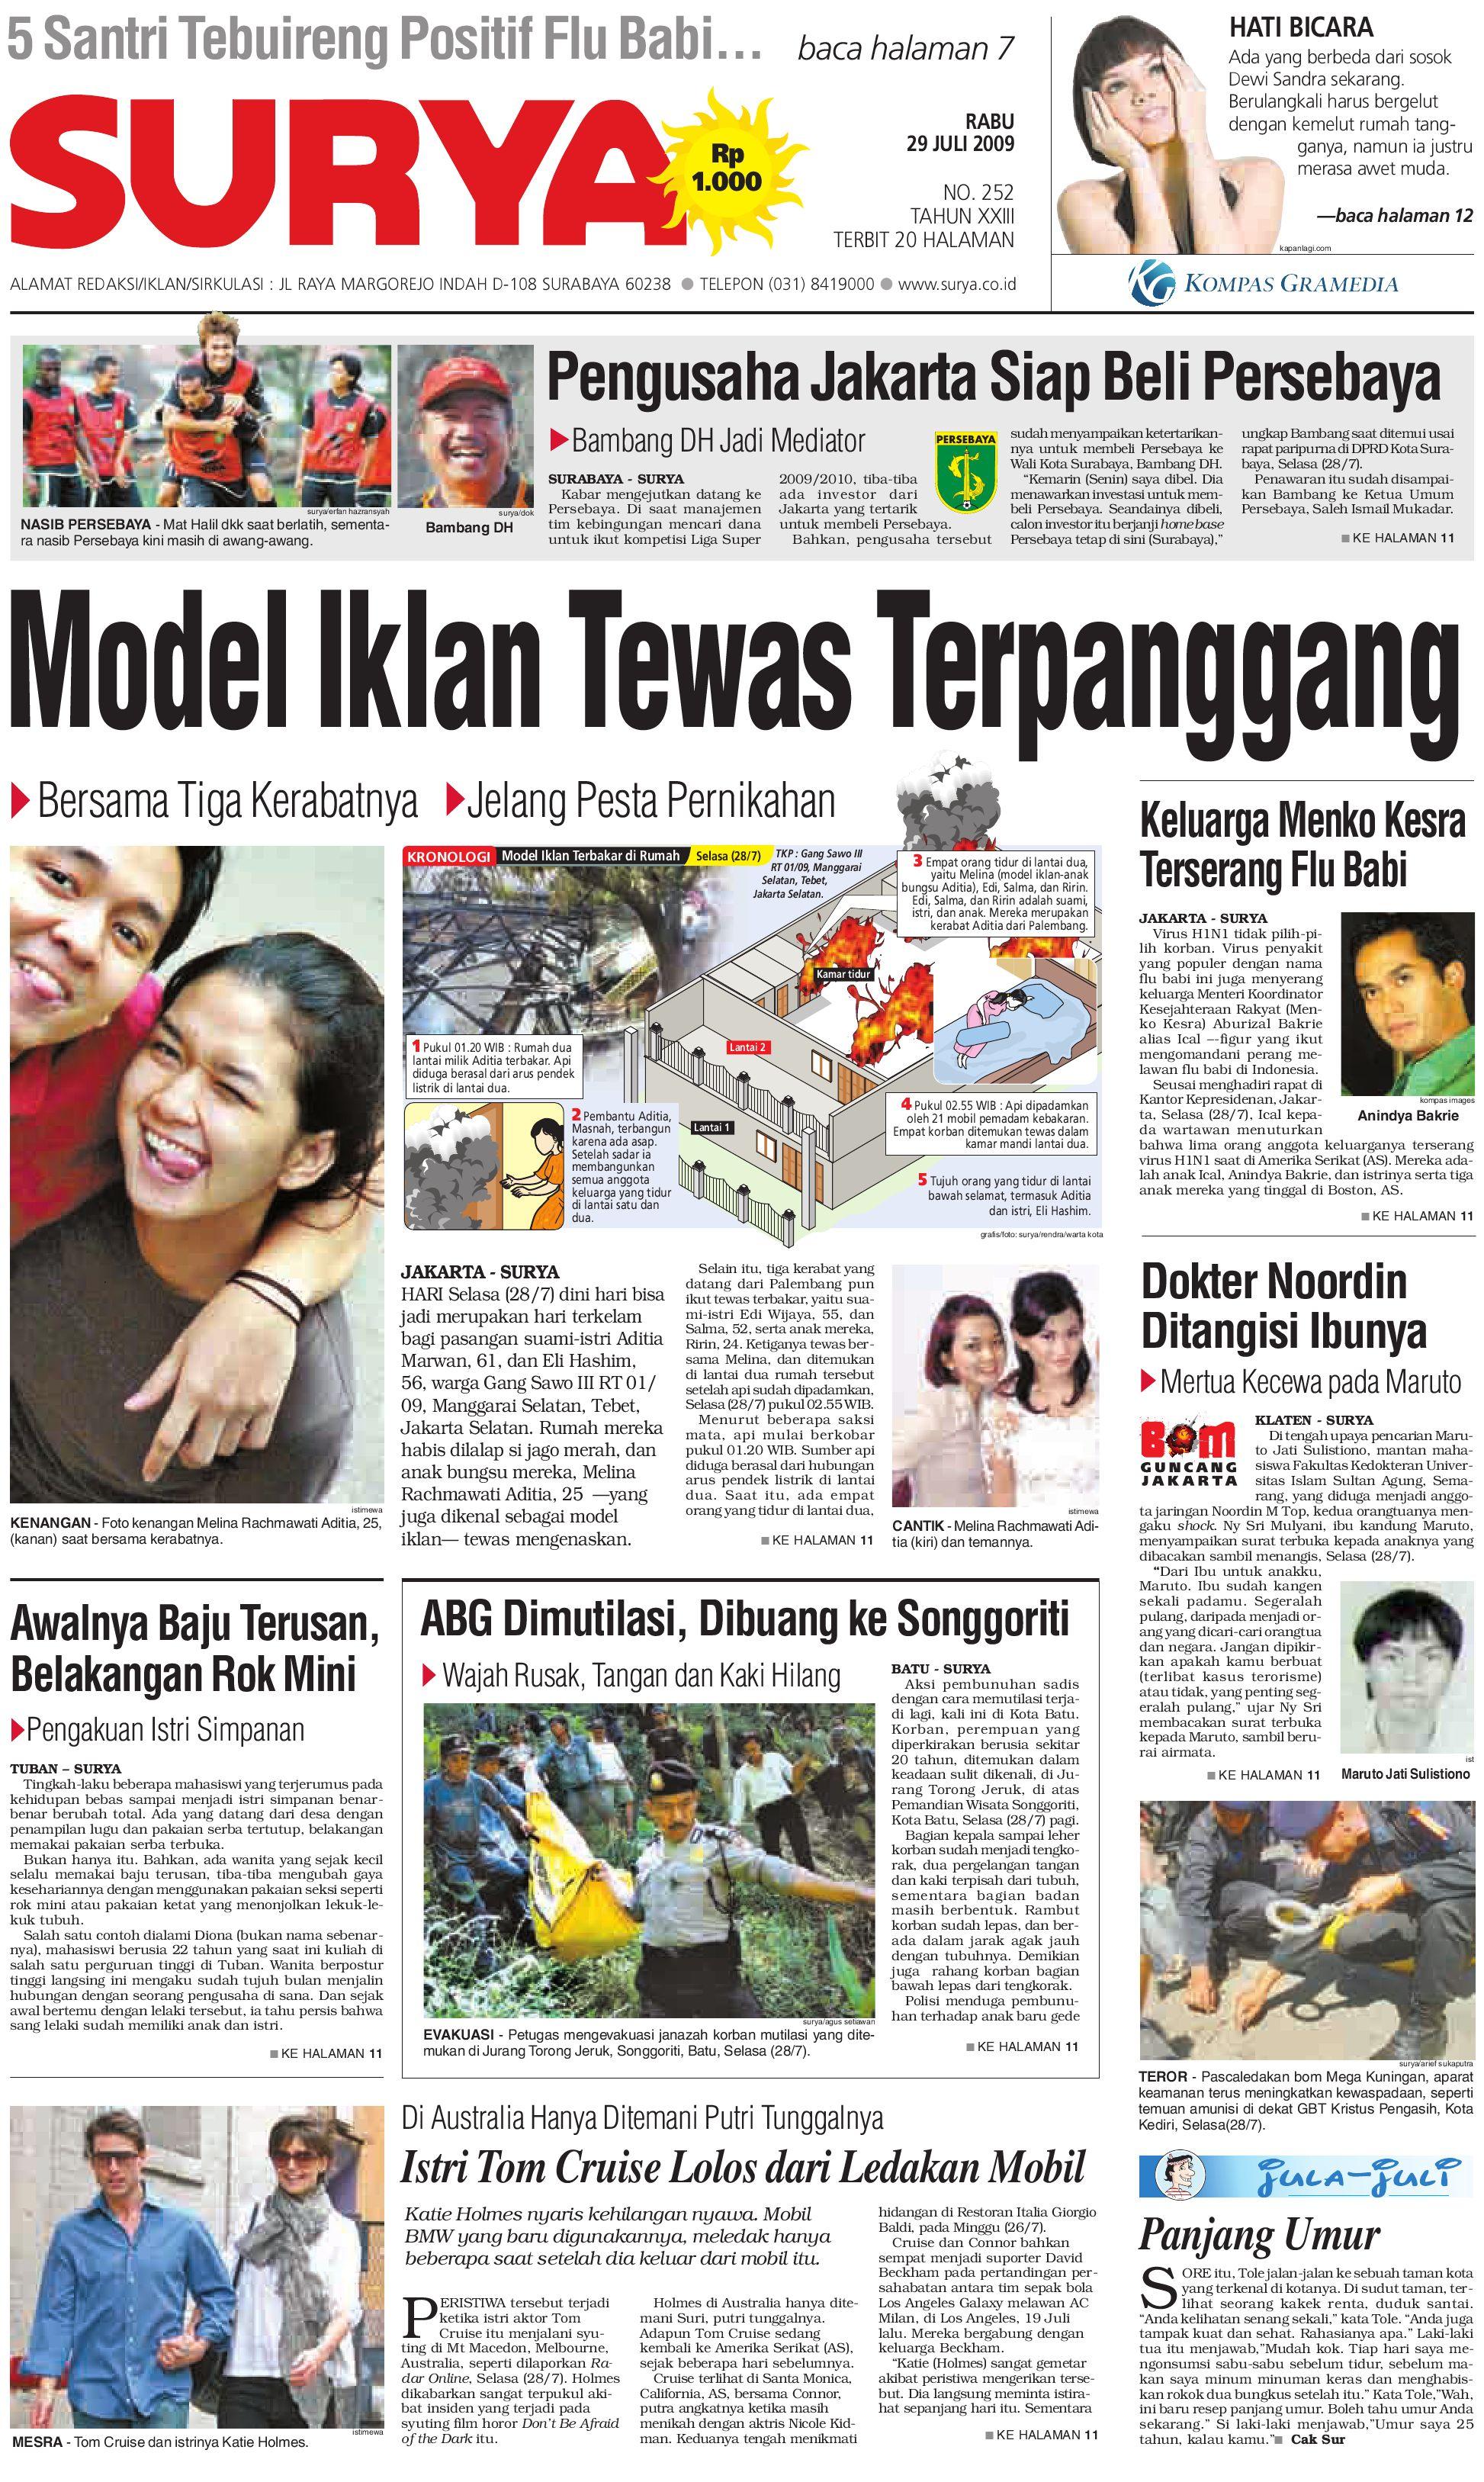 surya edisi cetak 29 juli 2009 by harian surya issuu